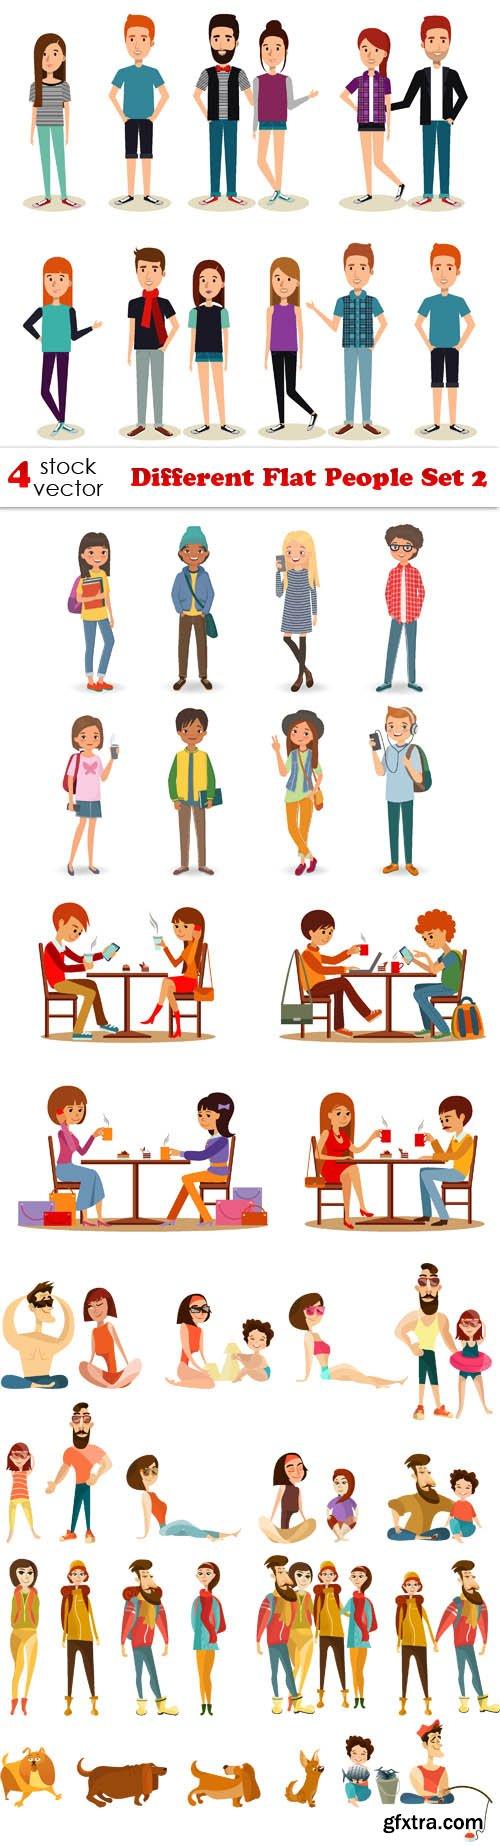 Vectors - Different Flat People Set 2